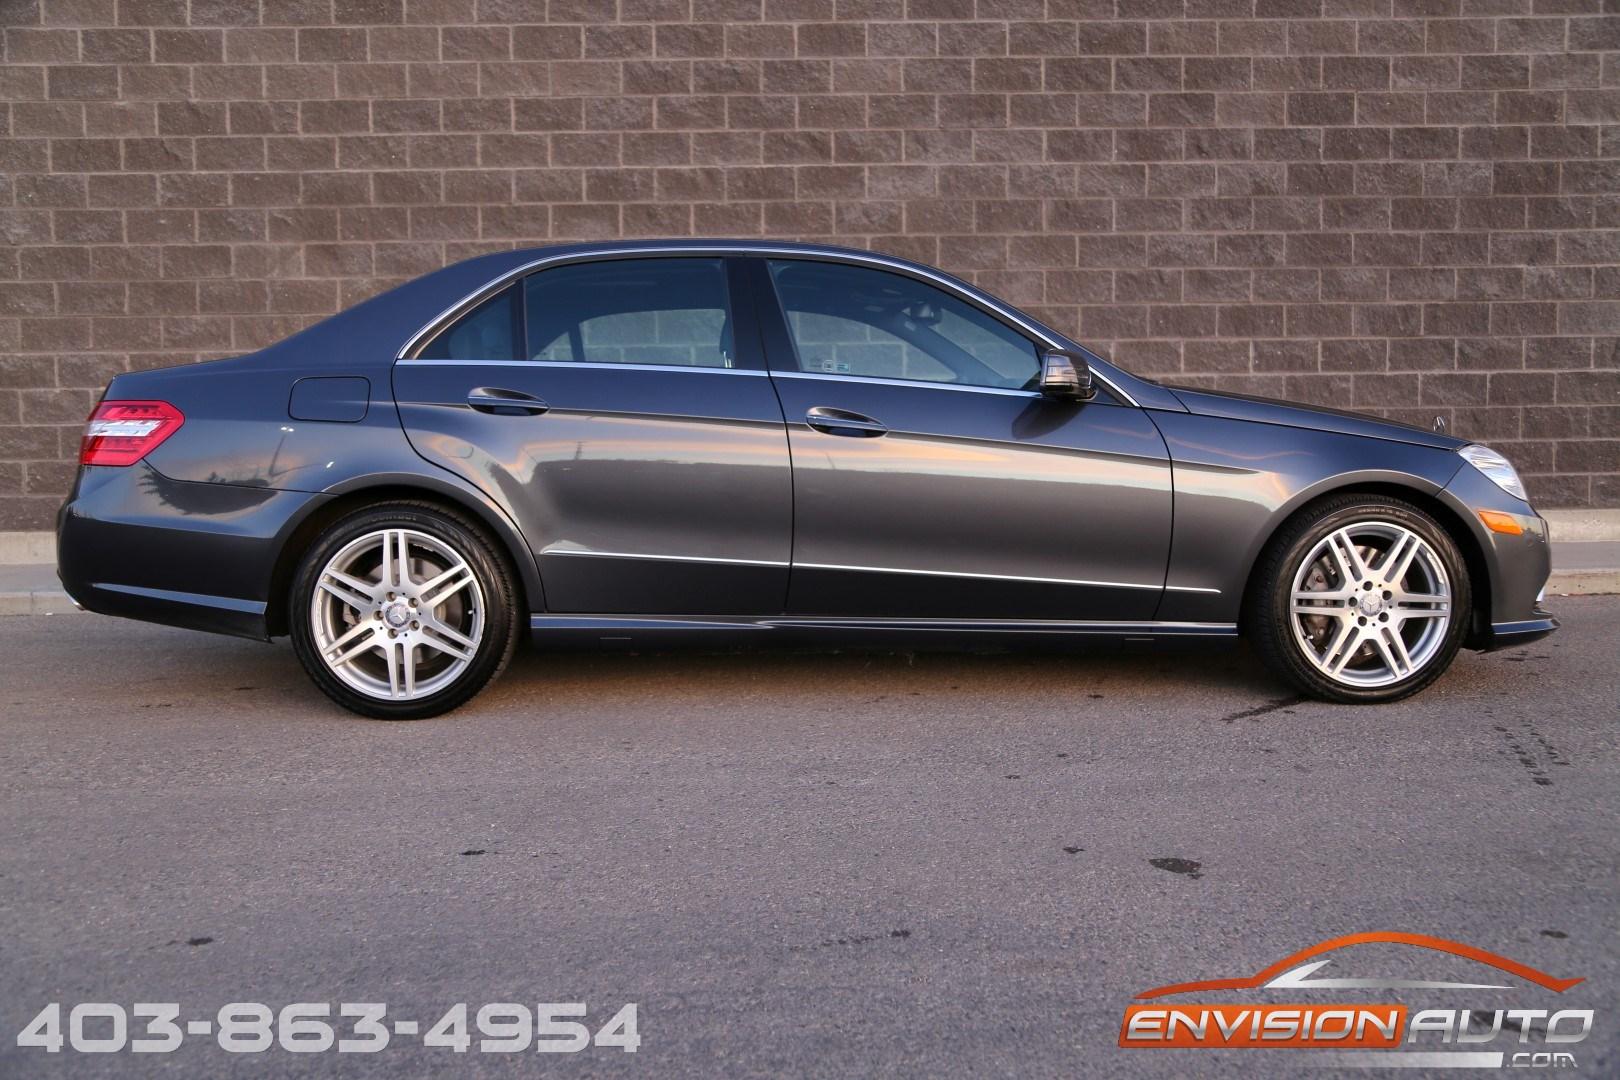 2010 mercedes benz e550 4matic spotless history envision for Mercedes benz e550 2010